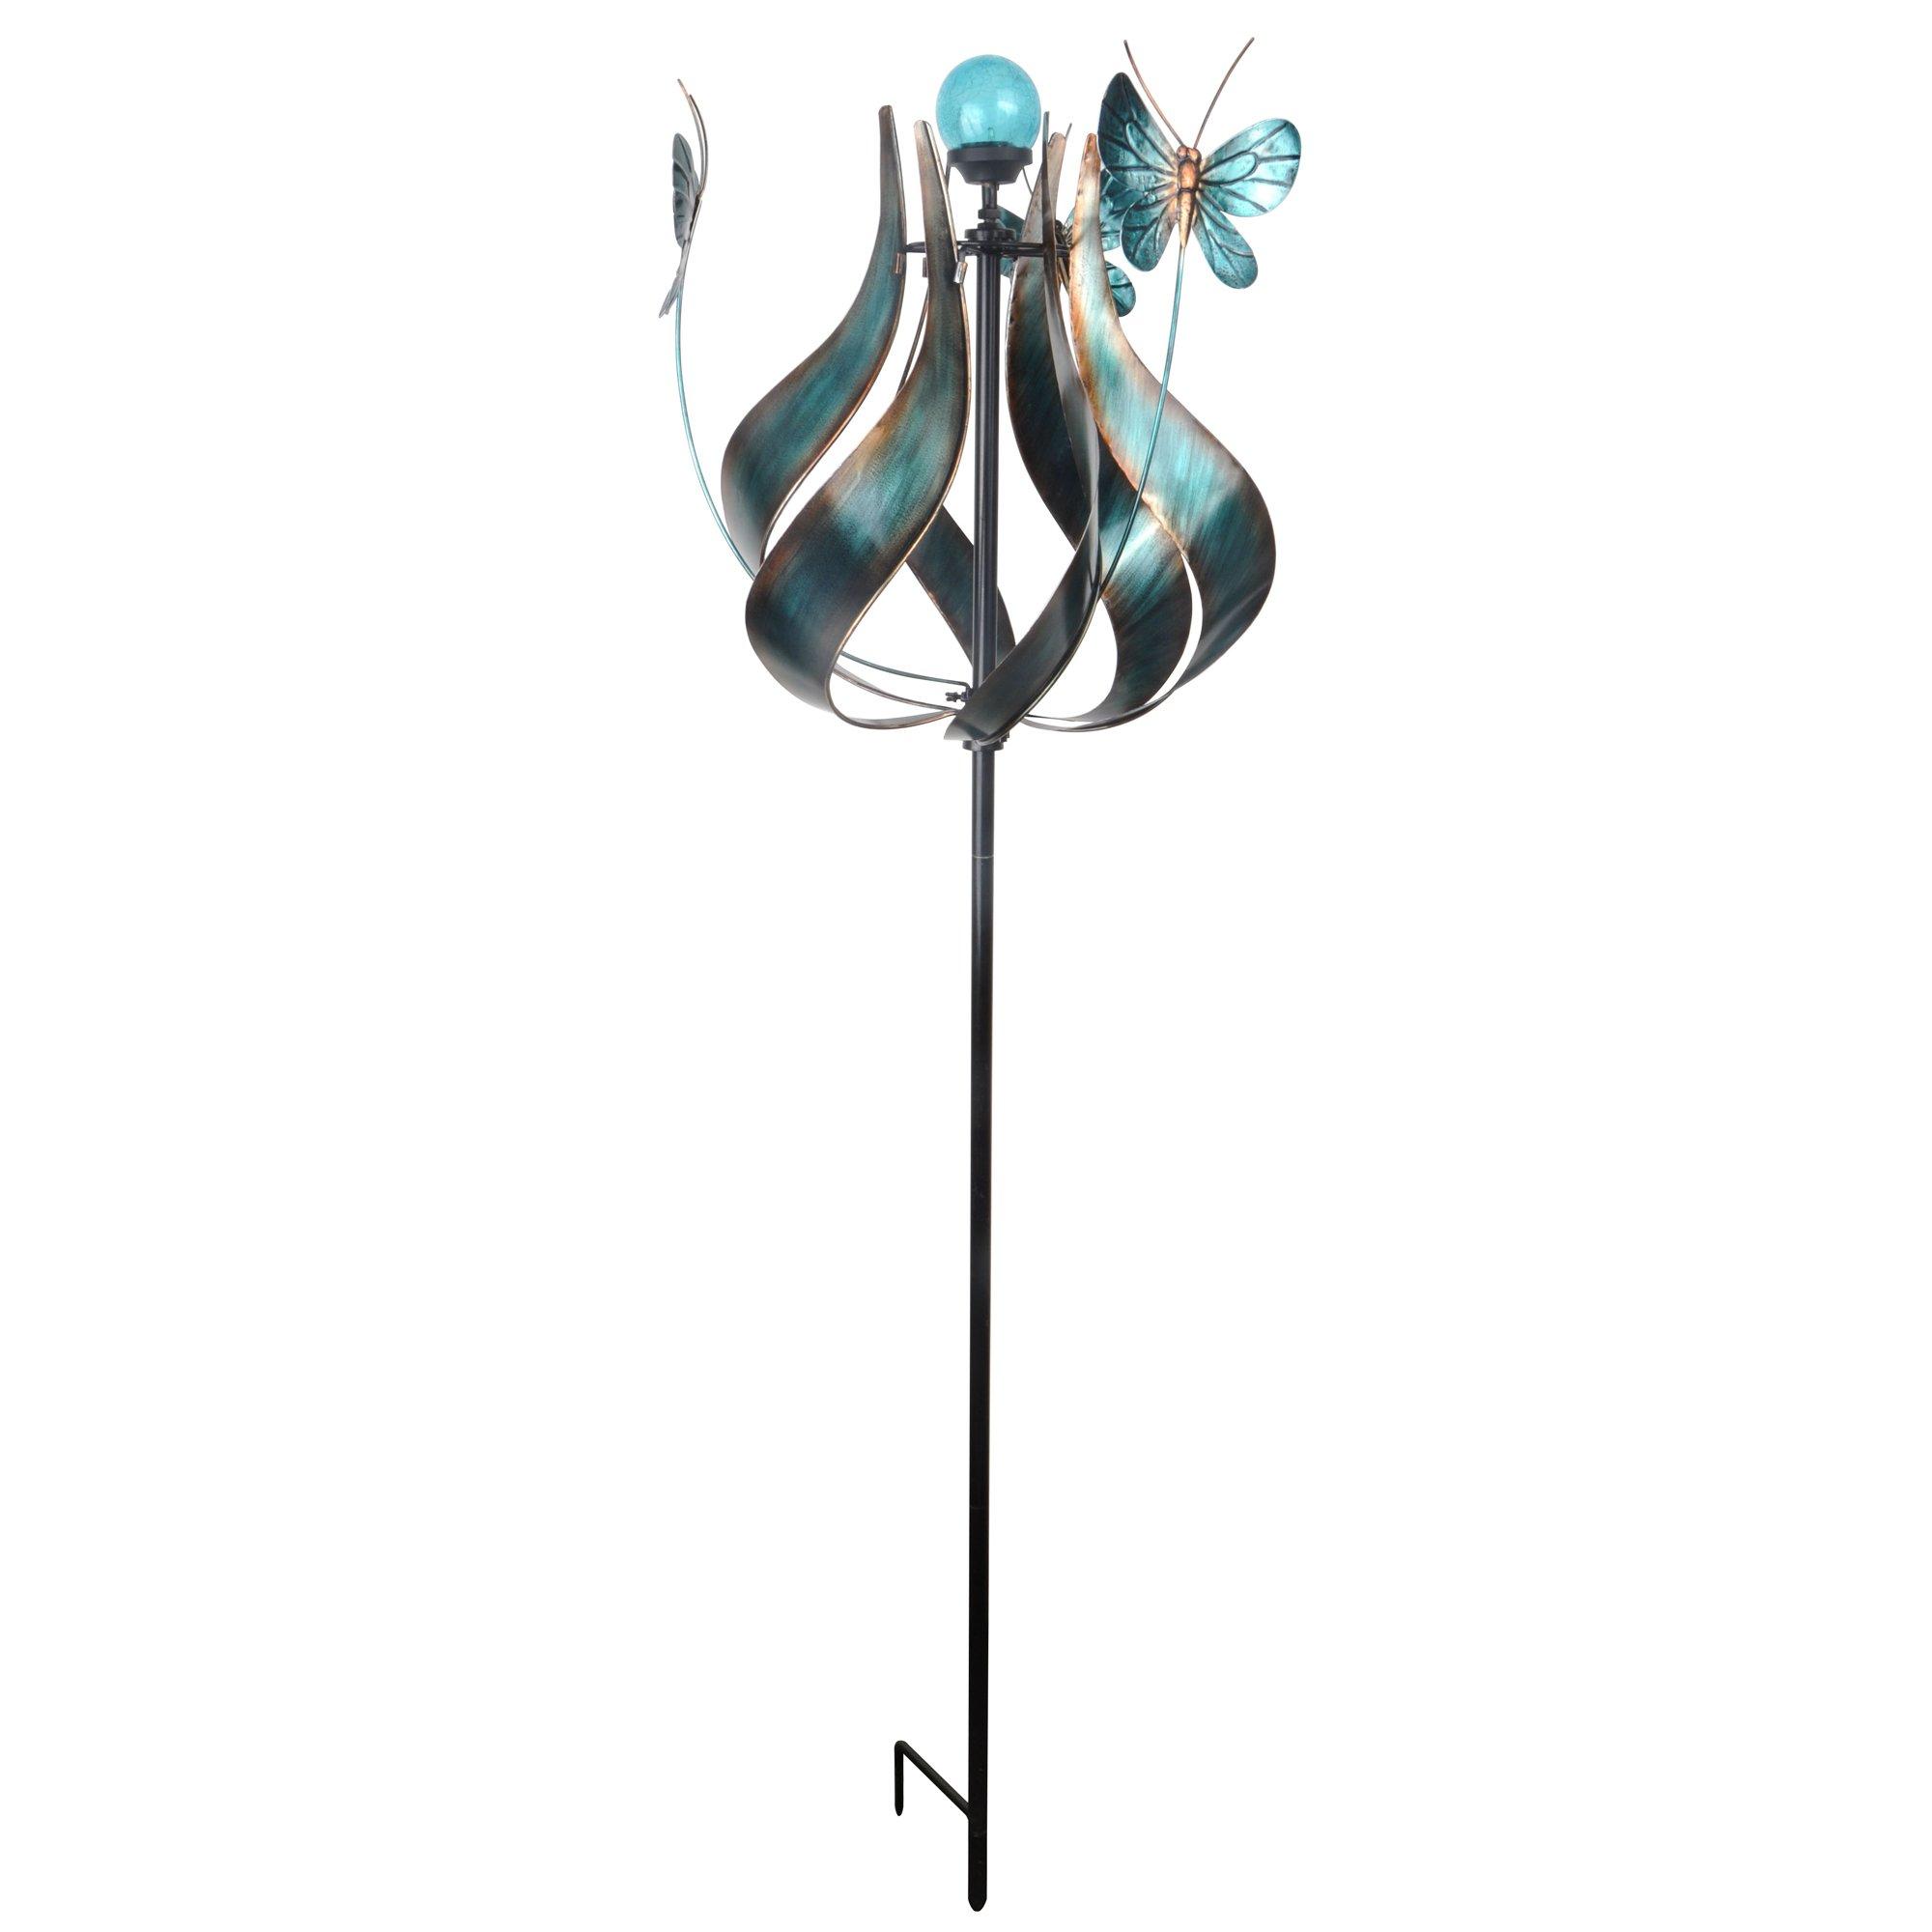 Peaktop Metallic Kinetic Tulip Windmill Garden Spinner with Butterflies, Teal